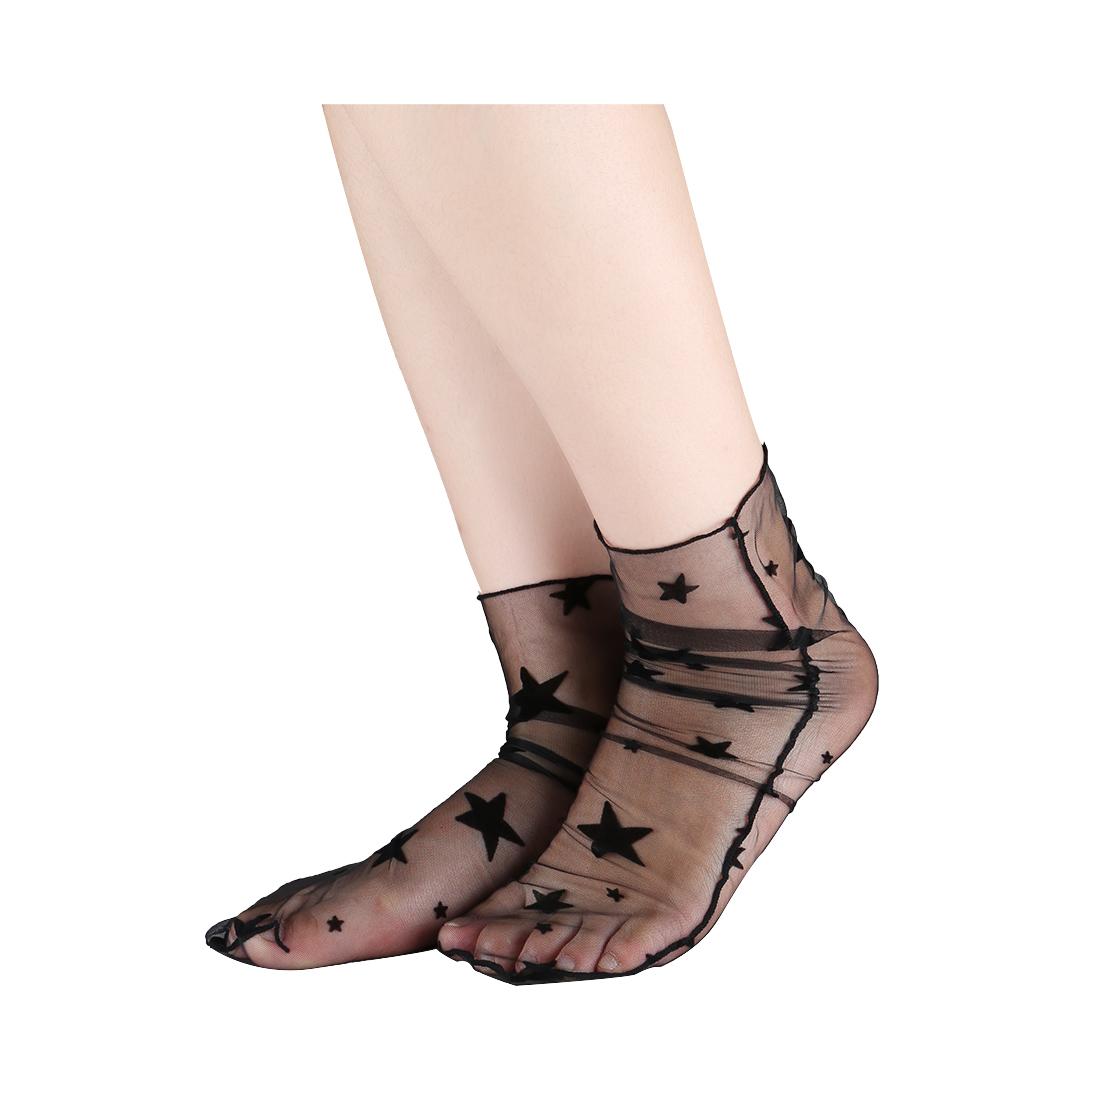 Women 10 Packs Lace Translucent Breathable Ankle High Sheer Socks Star Black